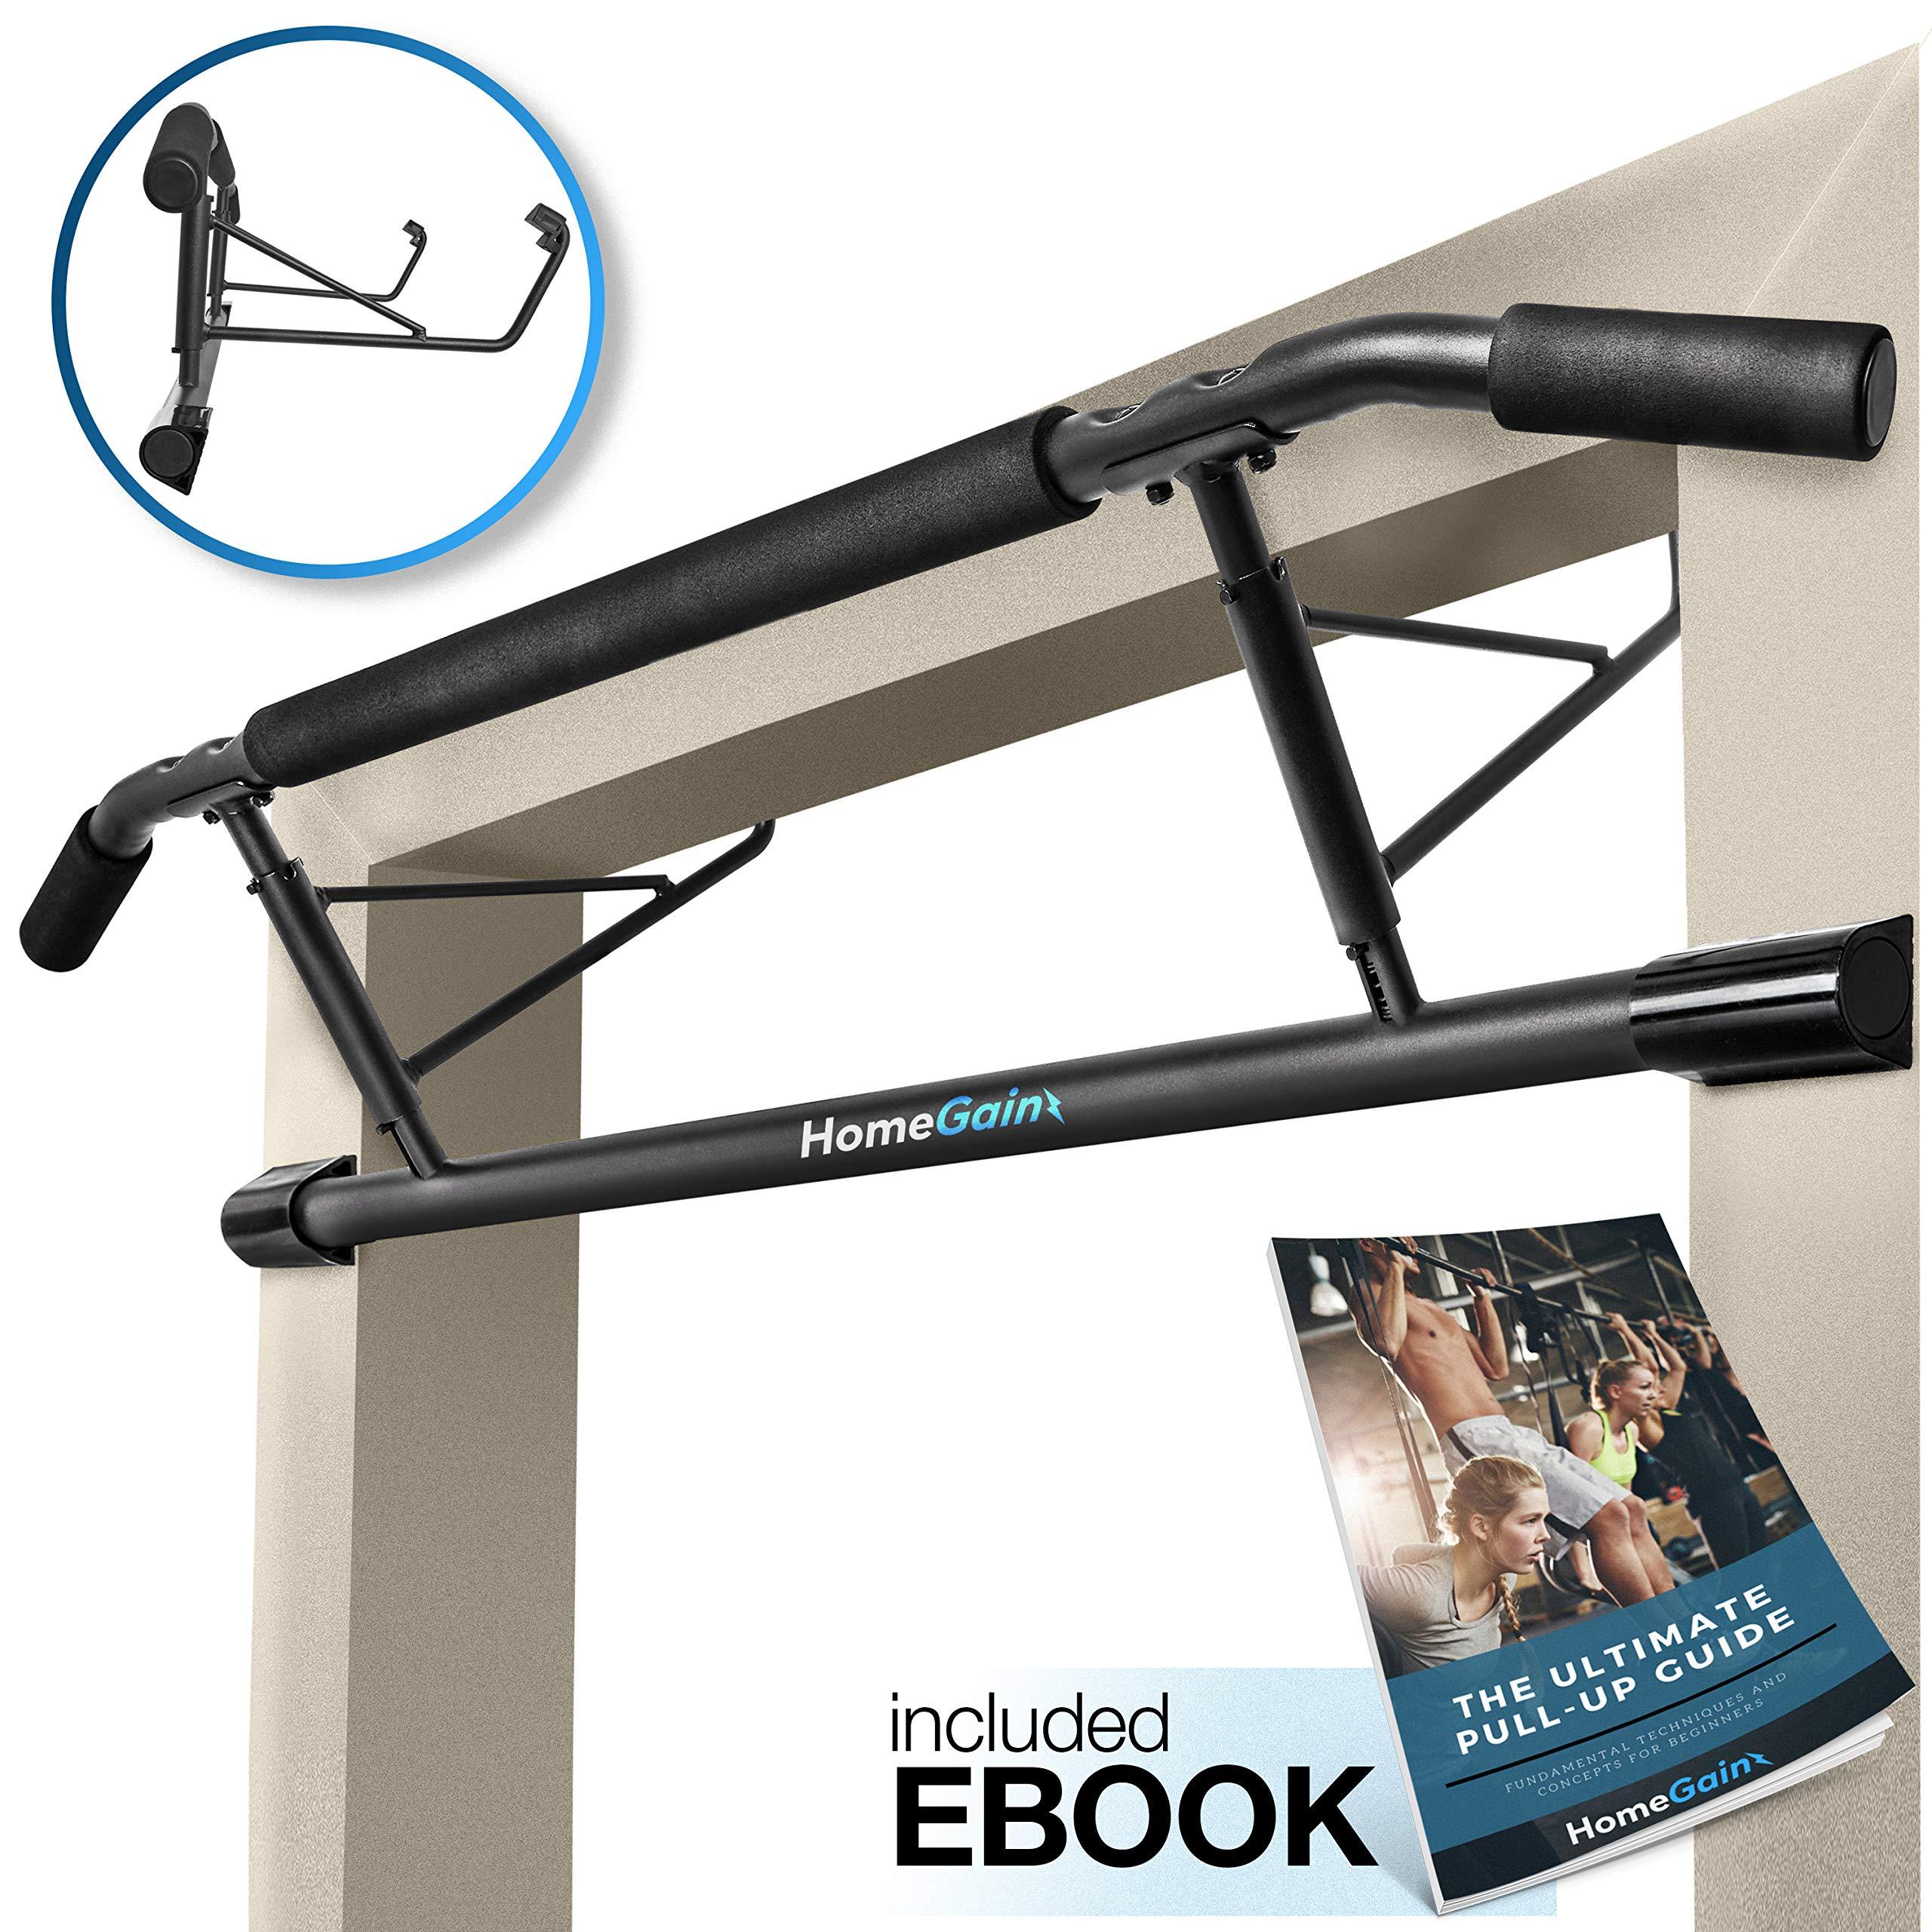 Homegainz Doorway Pull Up Bar, Door Frame Chin Up Bar for Home Gym, No Screws